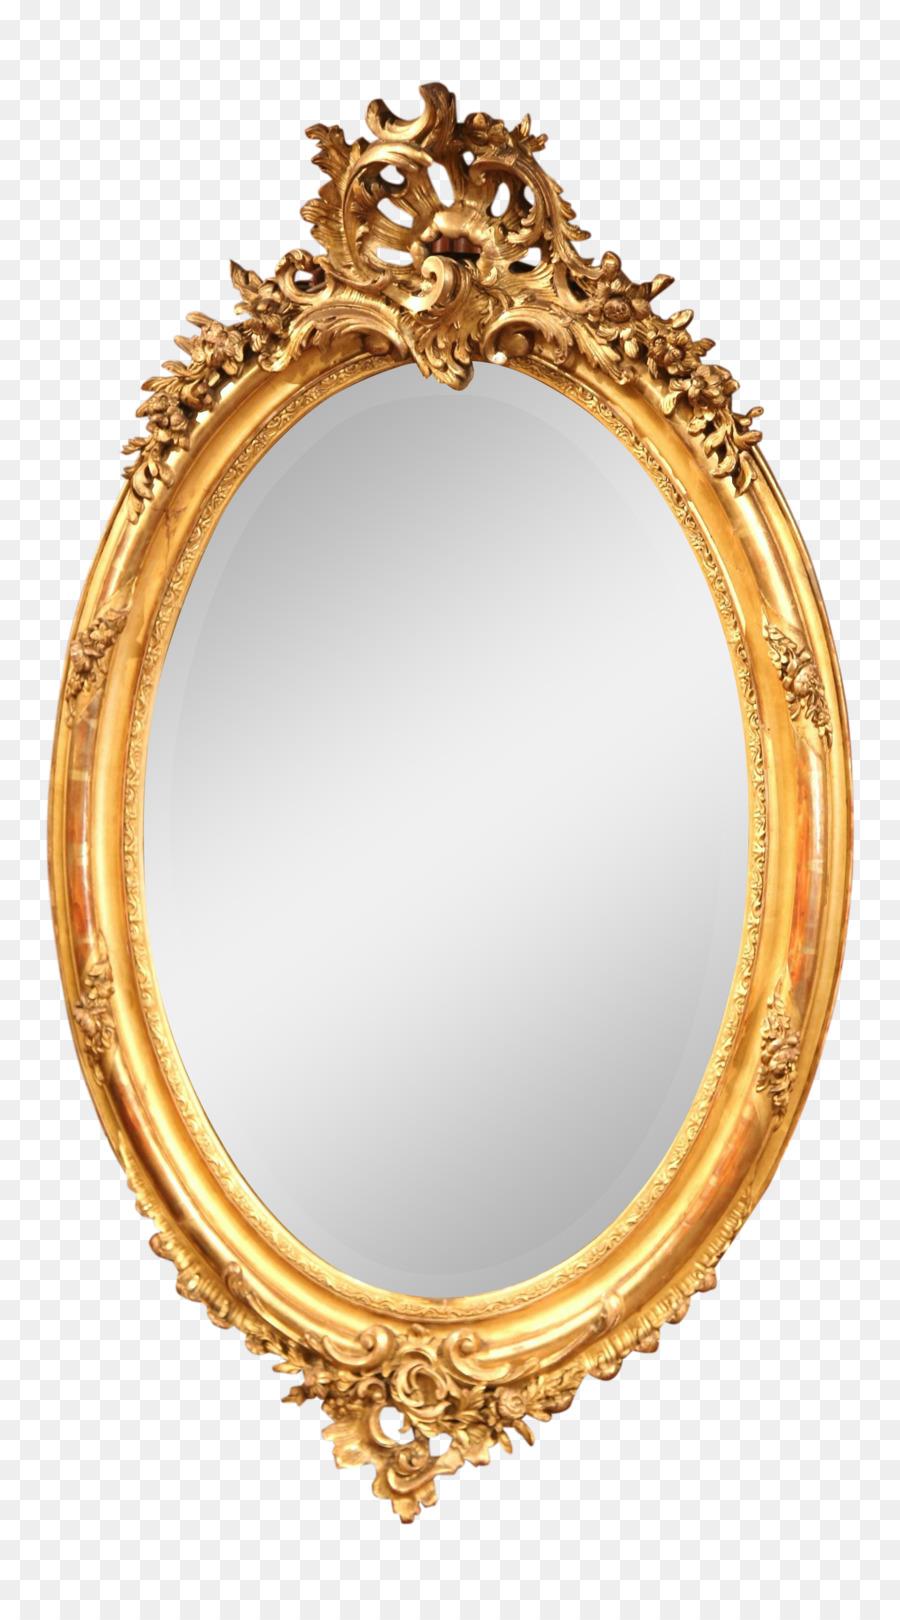 Honeycomb Mirror Beveled Glass Exquisite